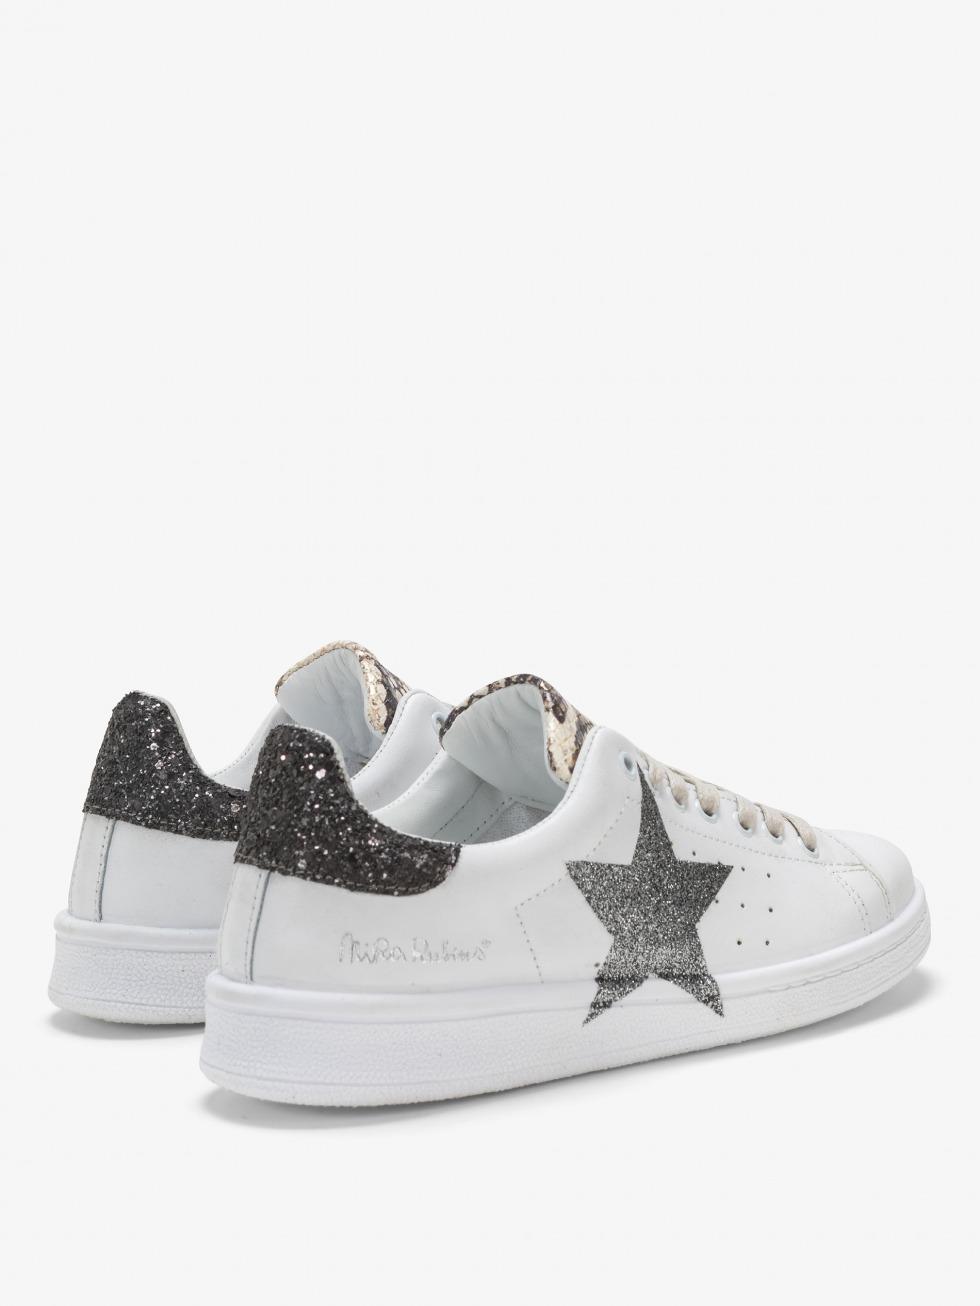 Daiquiri Cool White Sneakers - Star